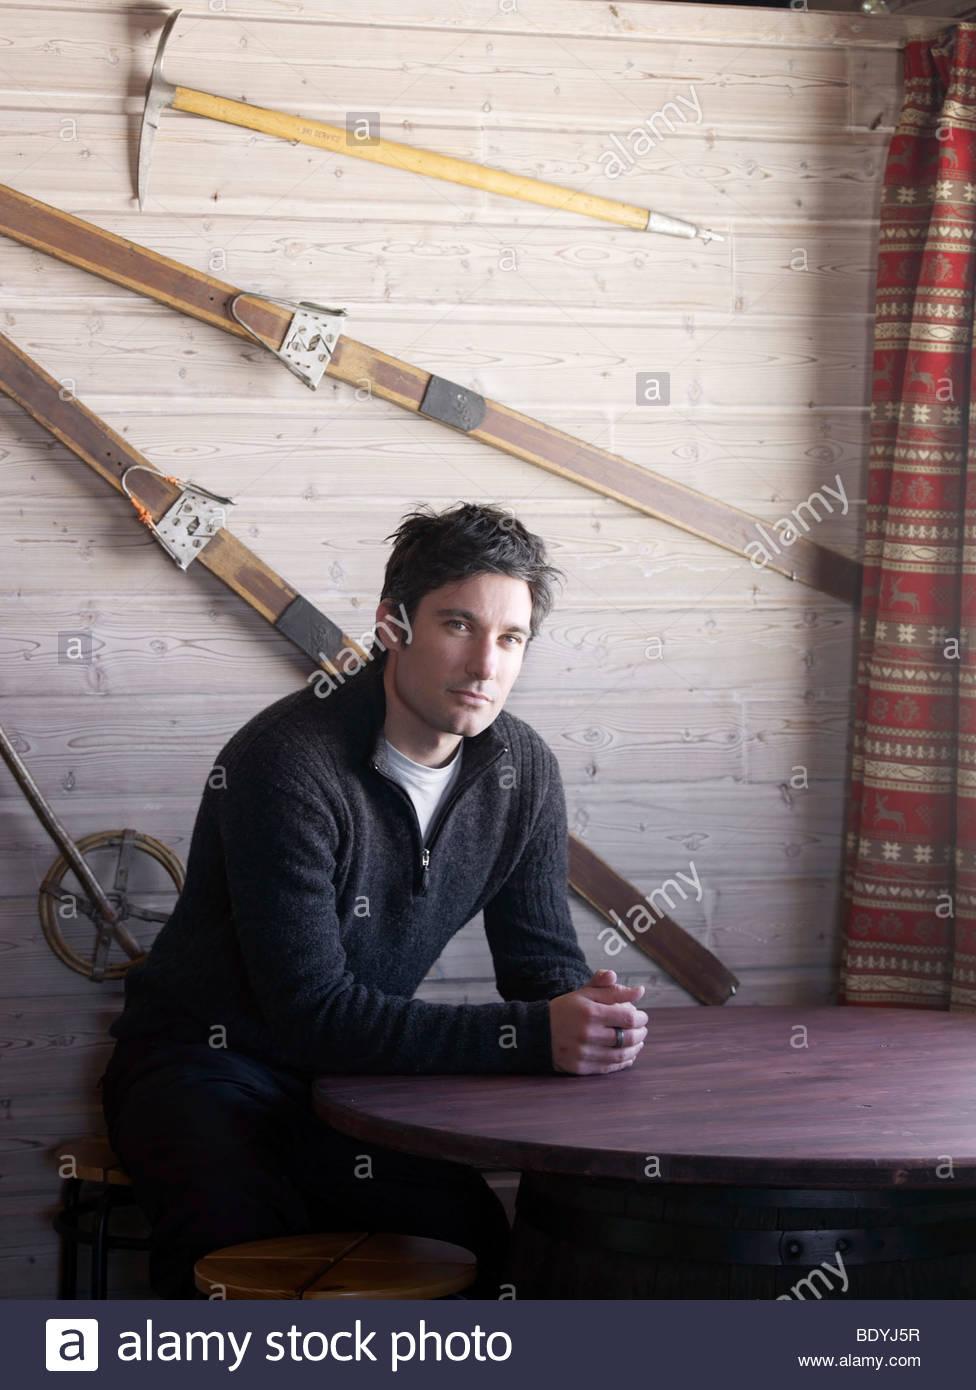 man sitting at ski lodge table - Stock Image